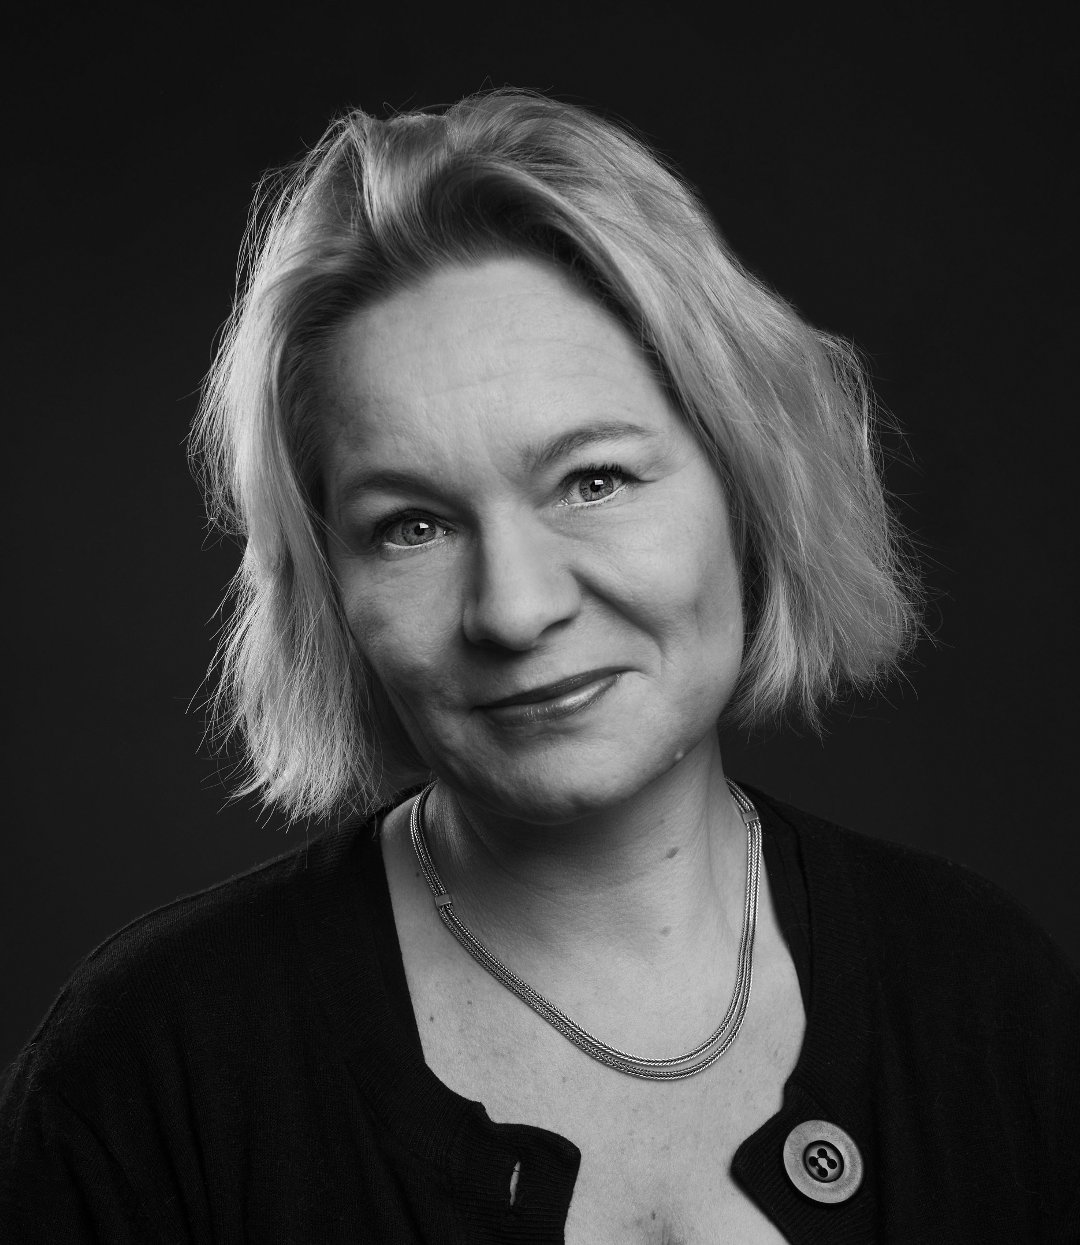 Hilde Rognskog